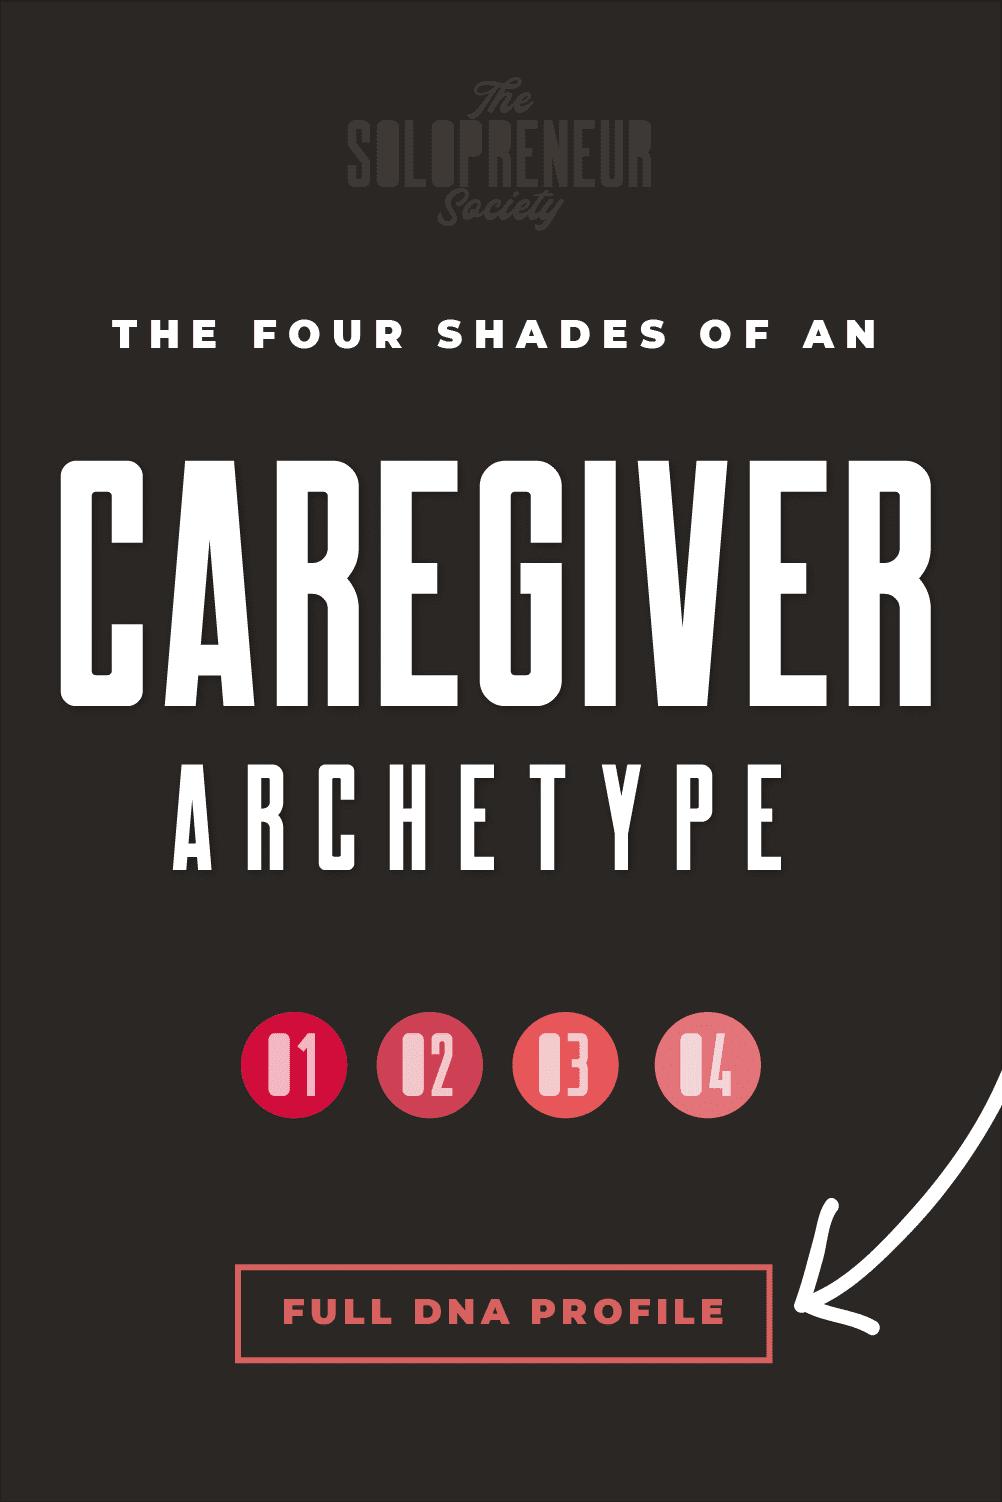 Caregiver Archetype Brand Personality